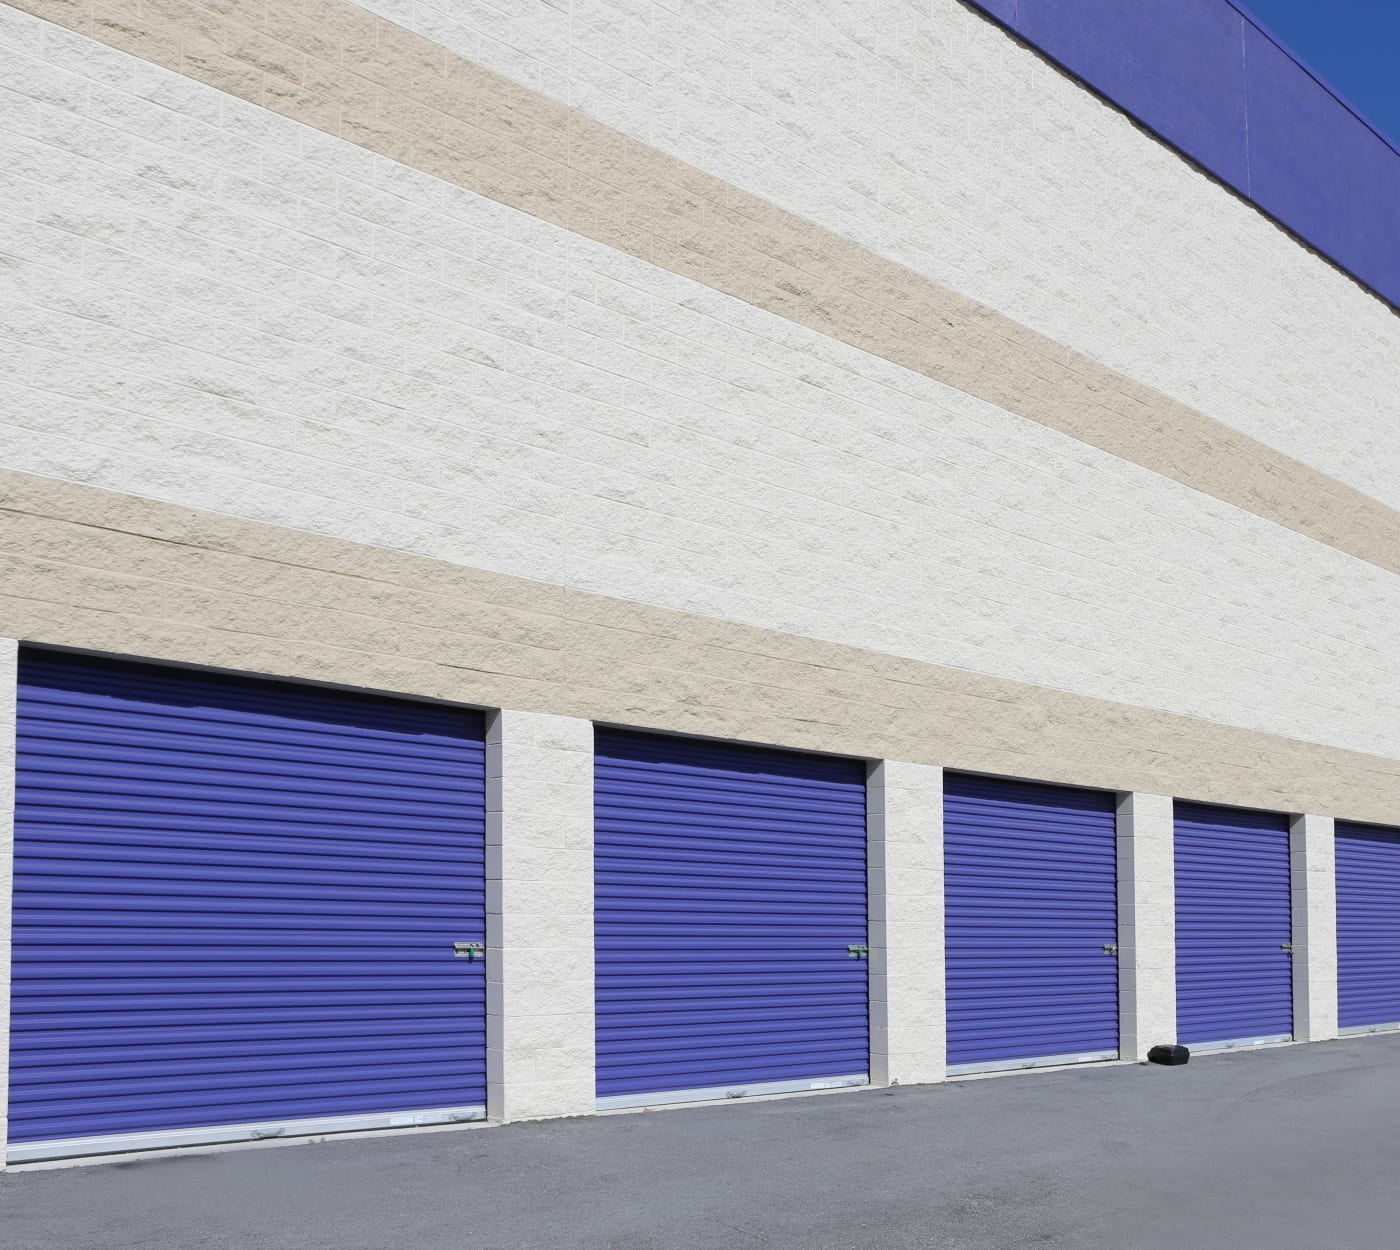 Ground-floor units at StoreSmart Self-Storage in Spring Lake, North Carolina